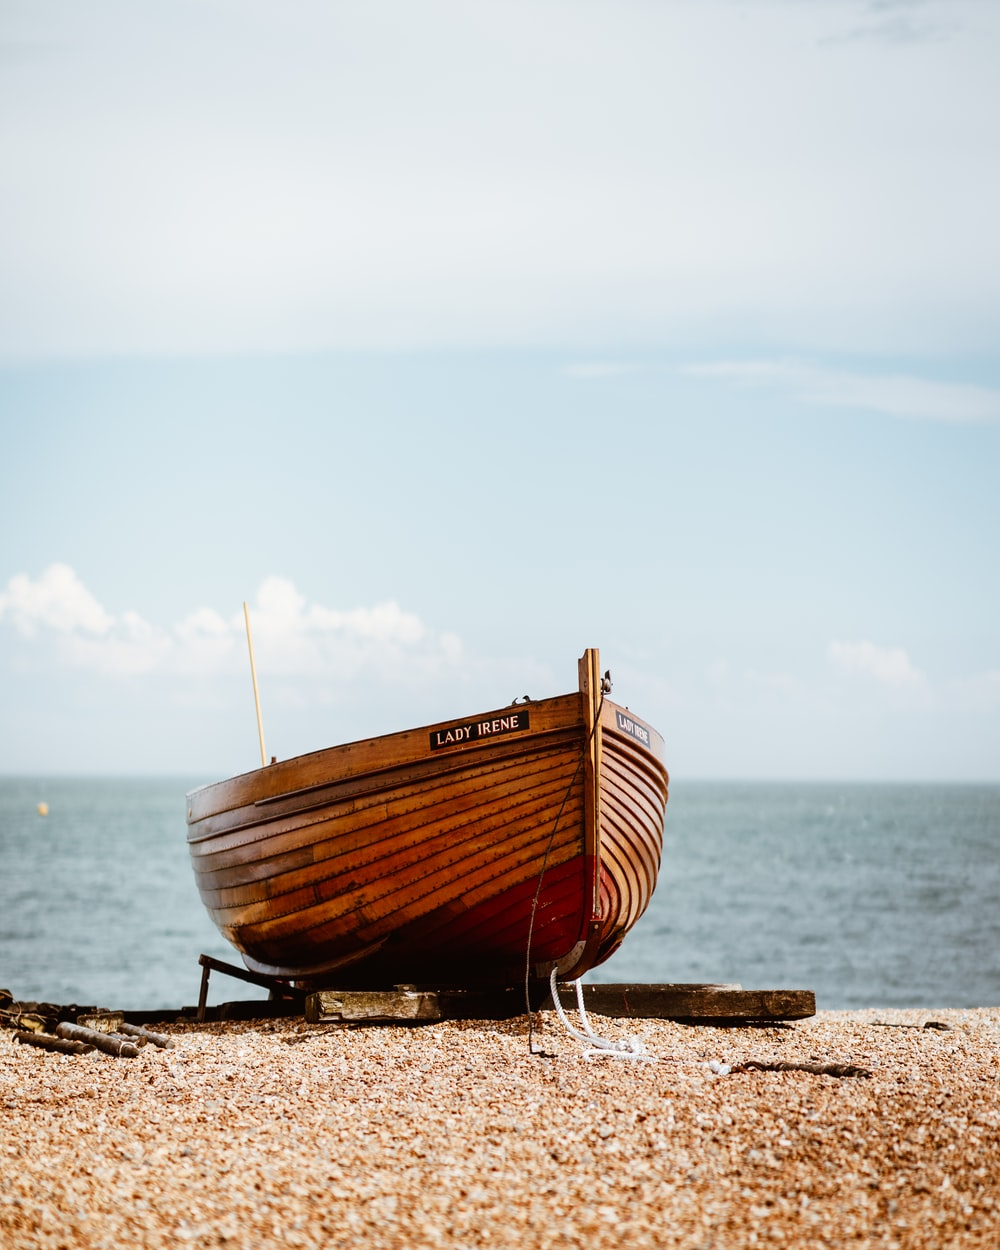 brown boat near body of water